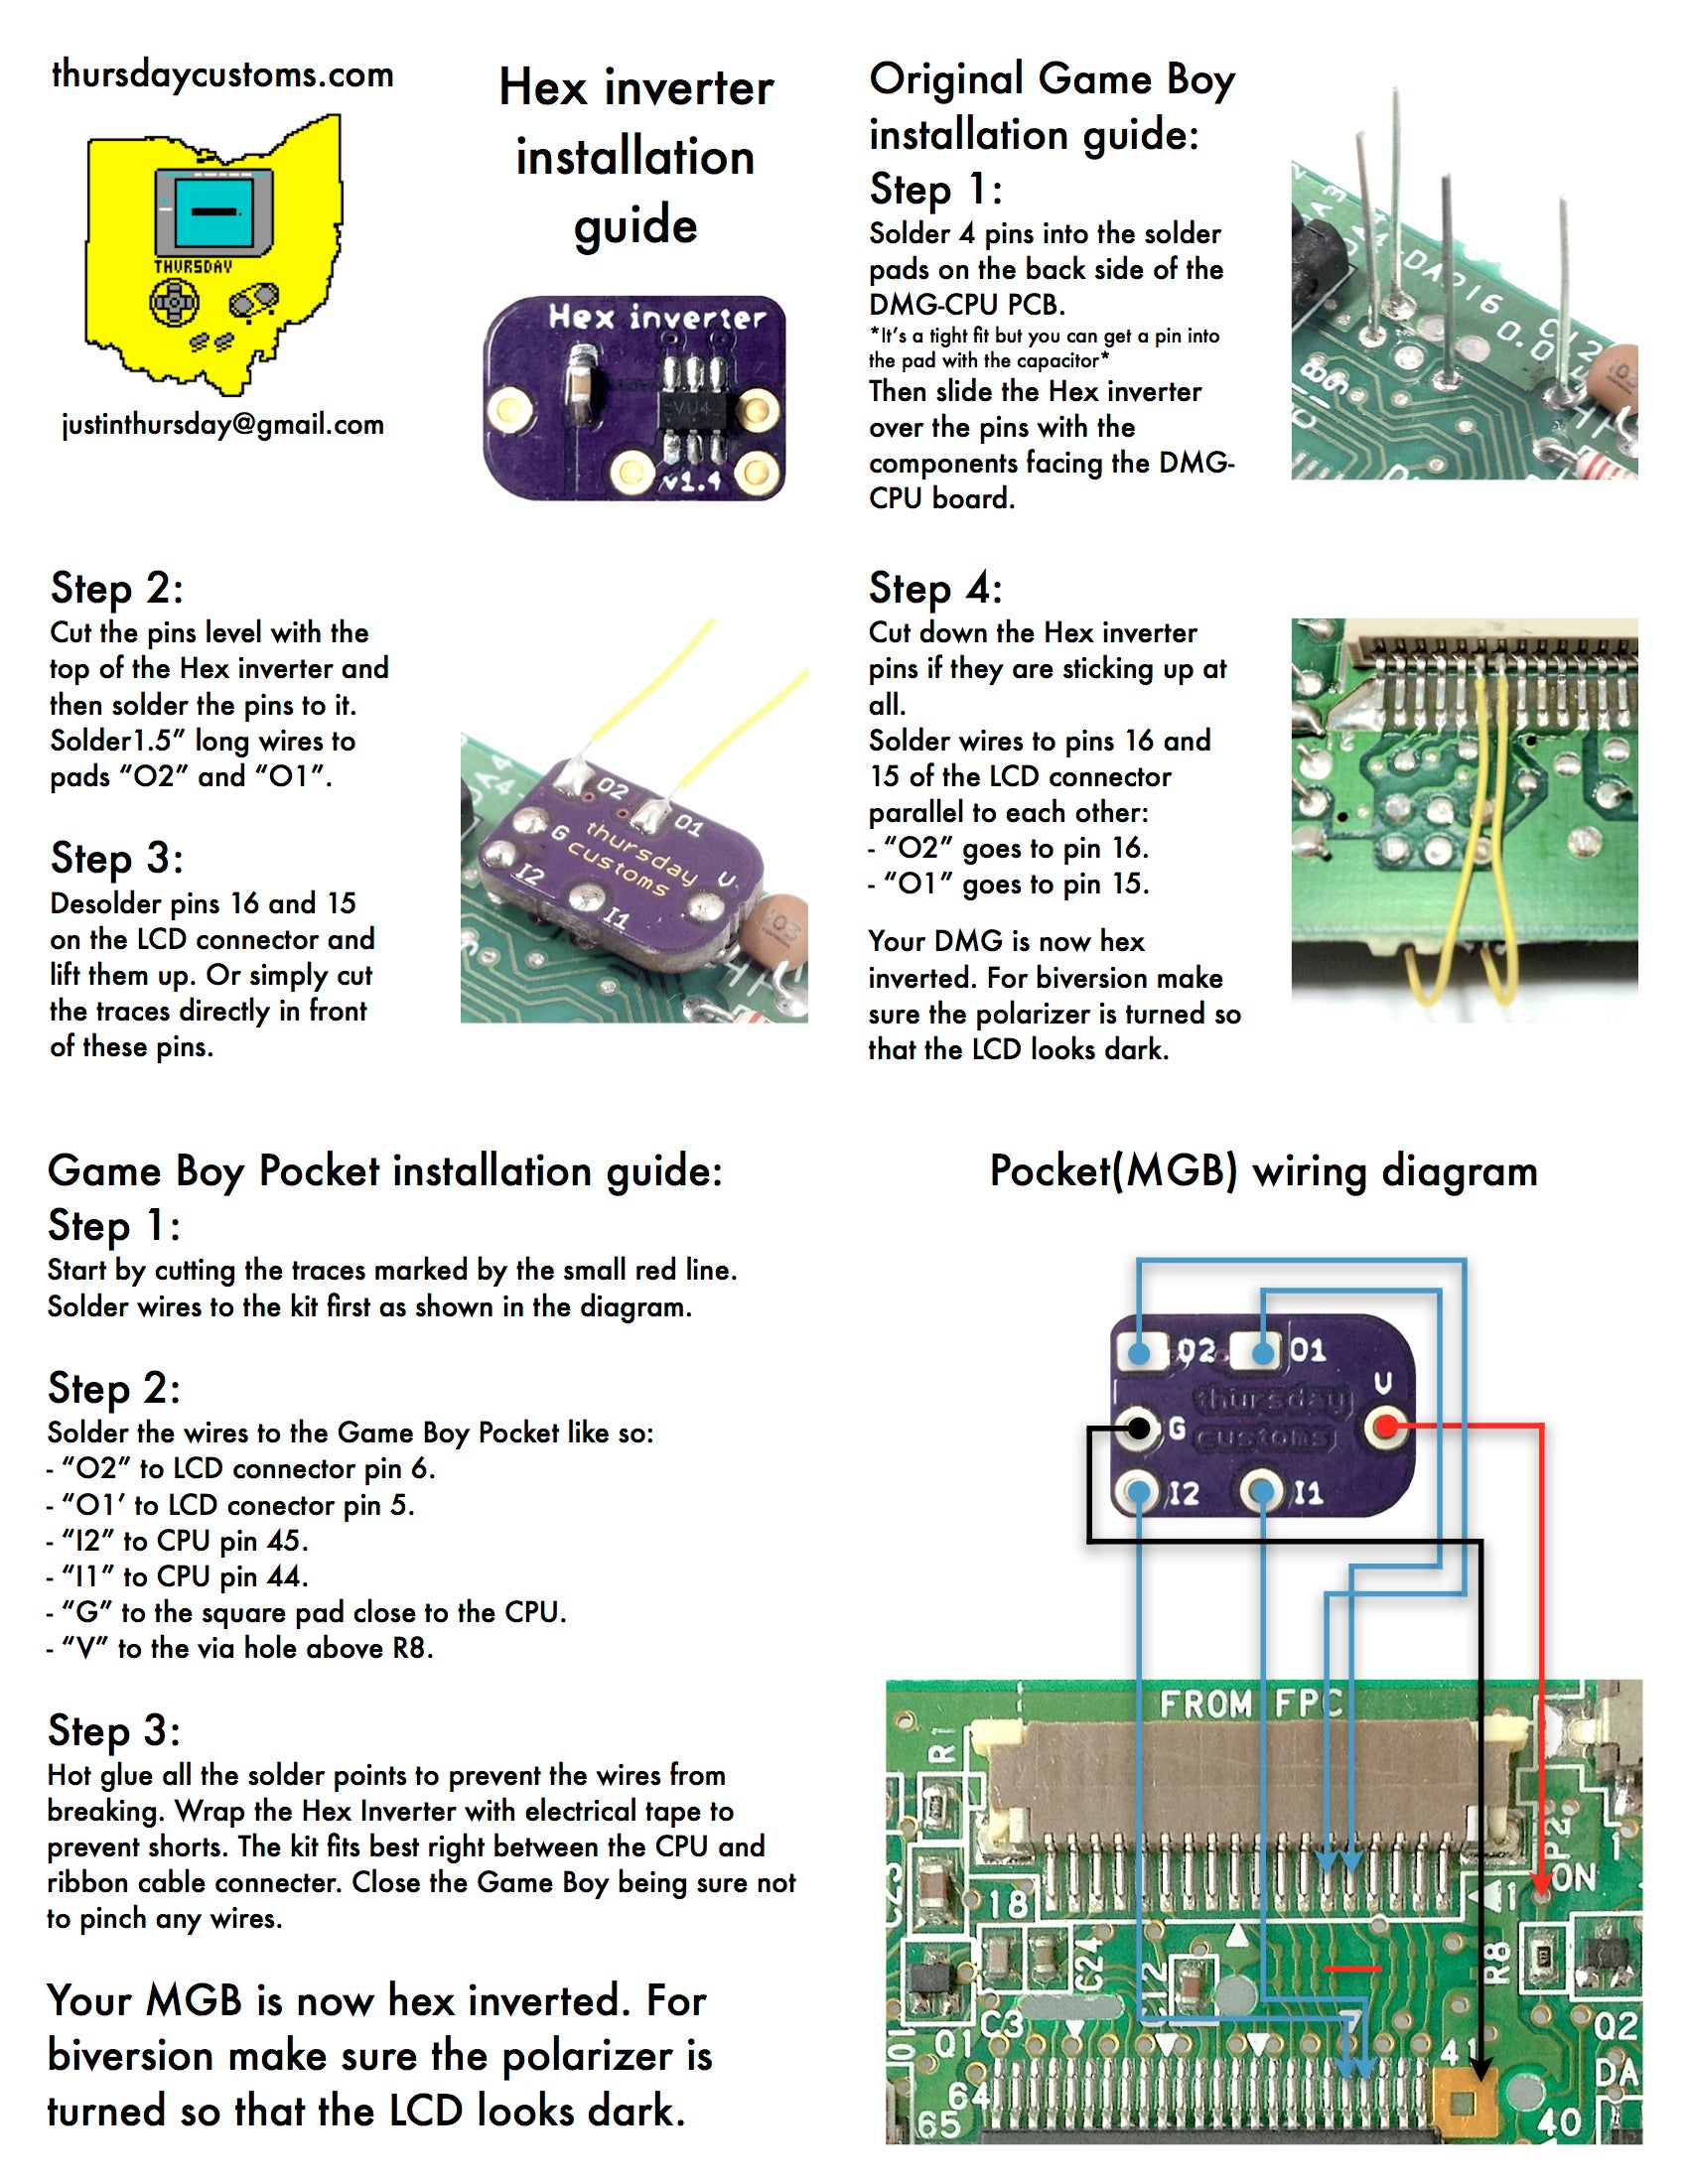 Eclipse Hex 5 Manual